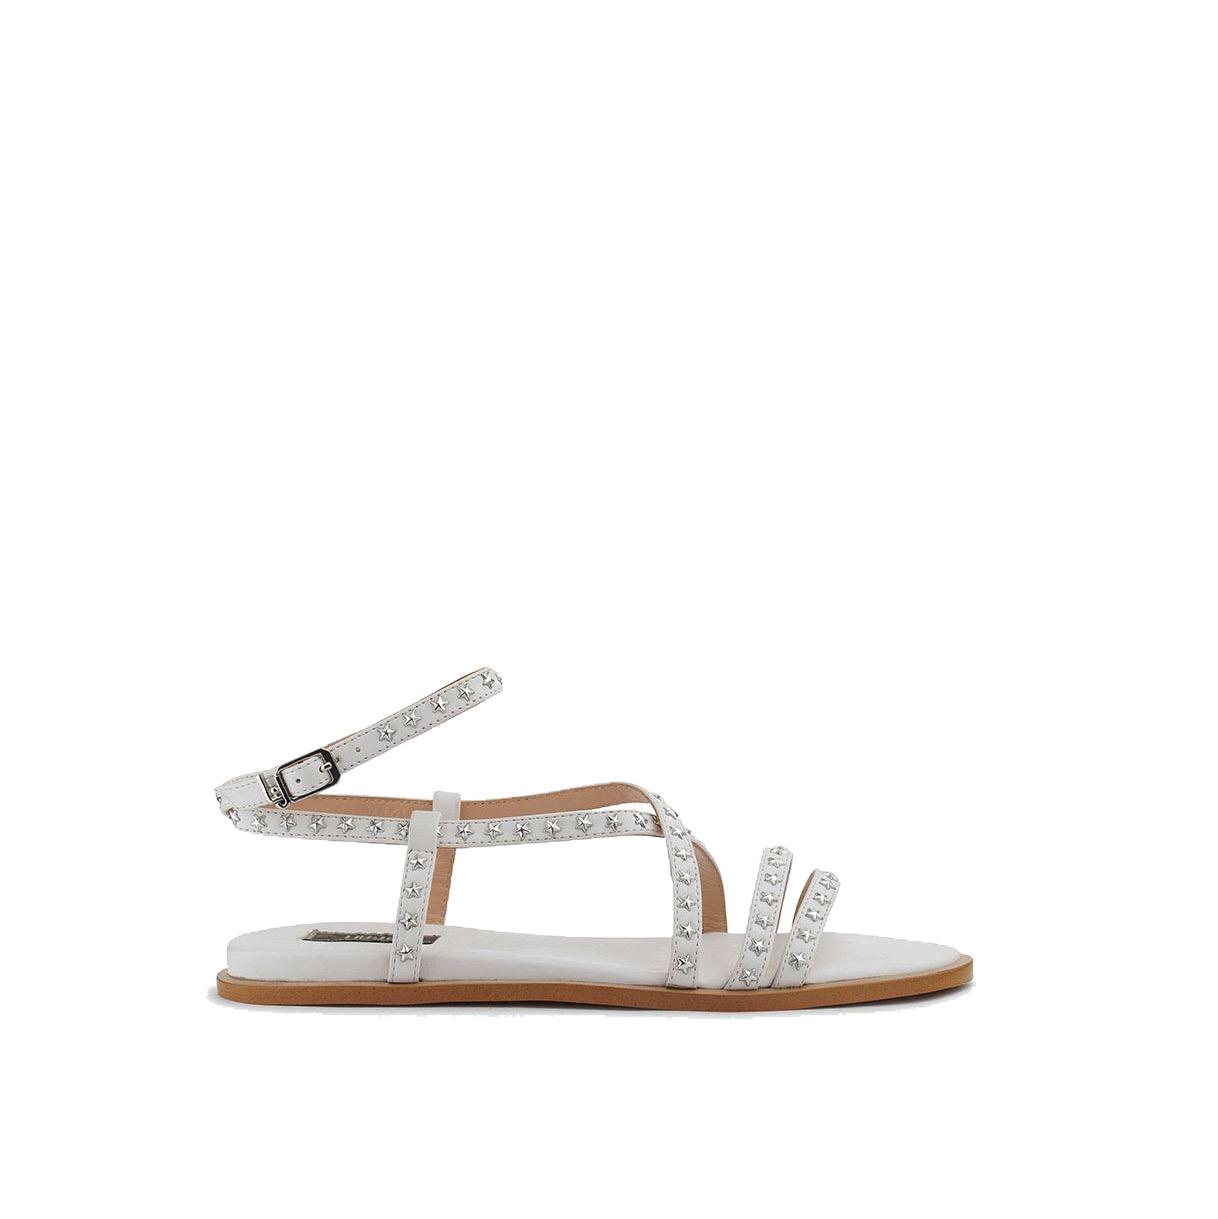 Thea sandals pelle bianca - LIU JO